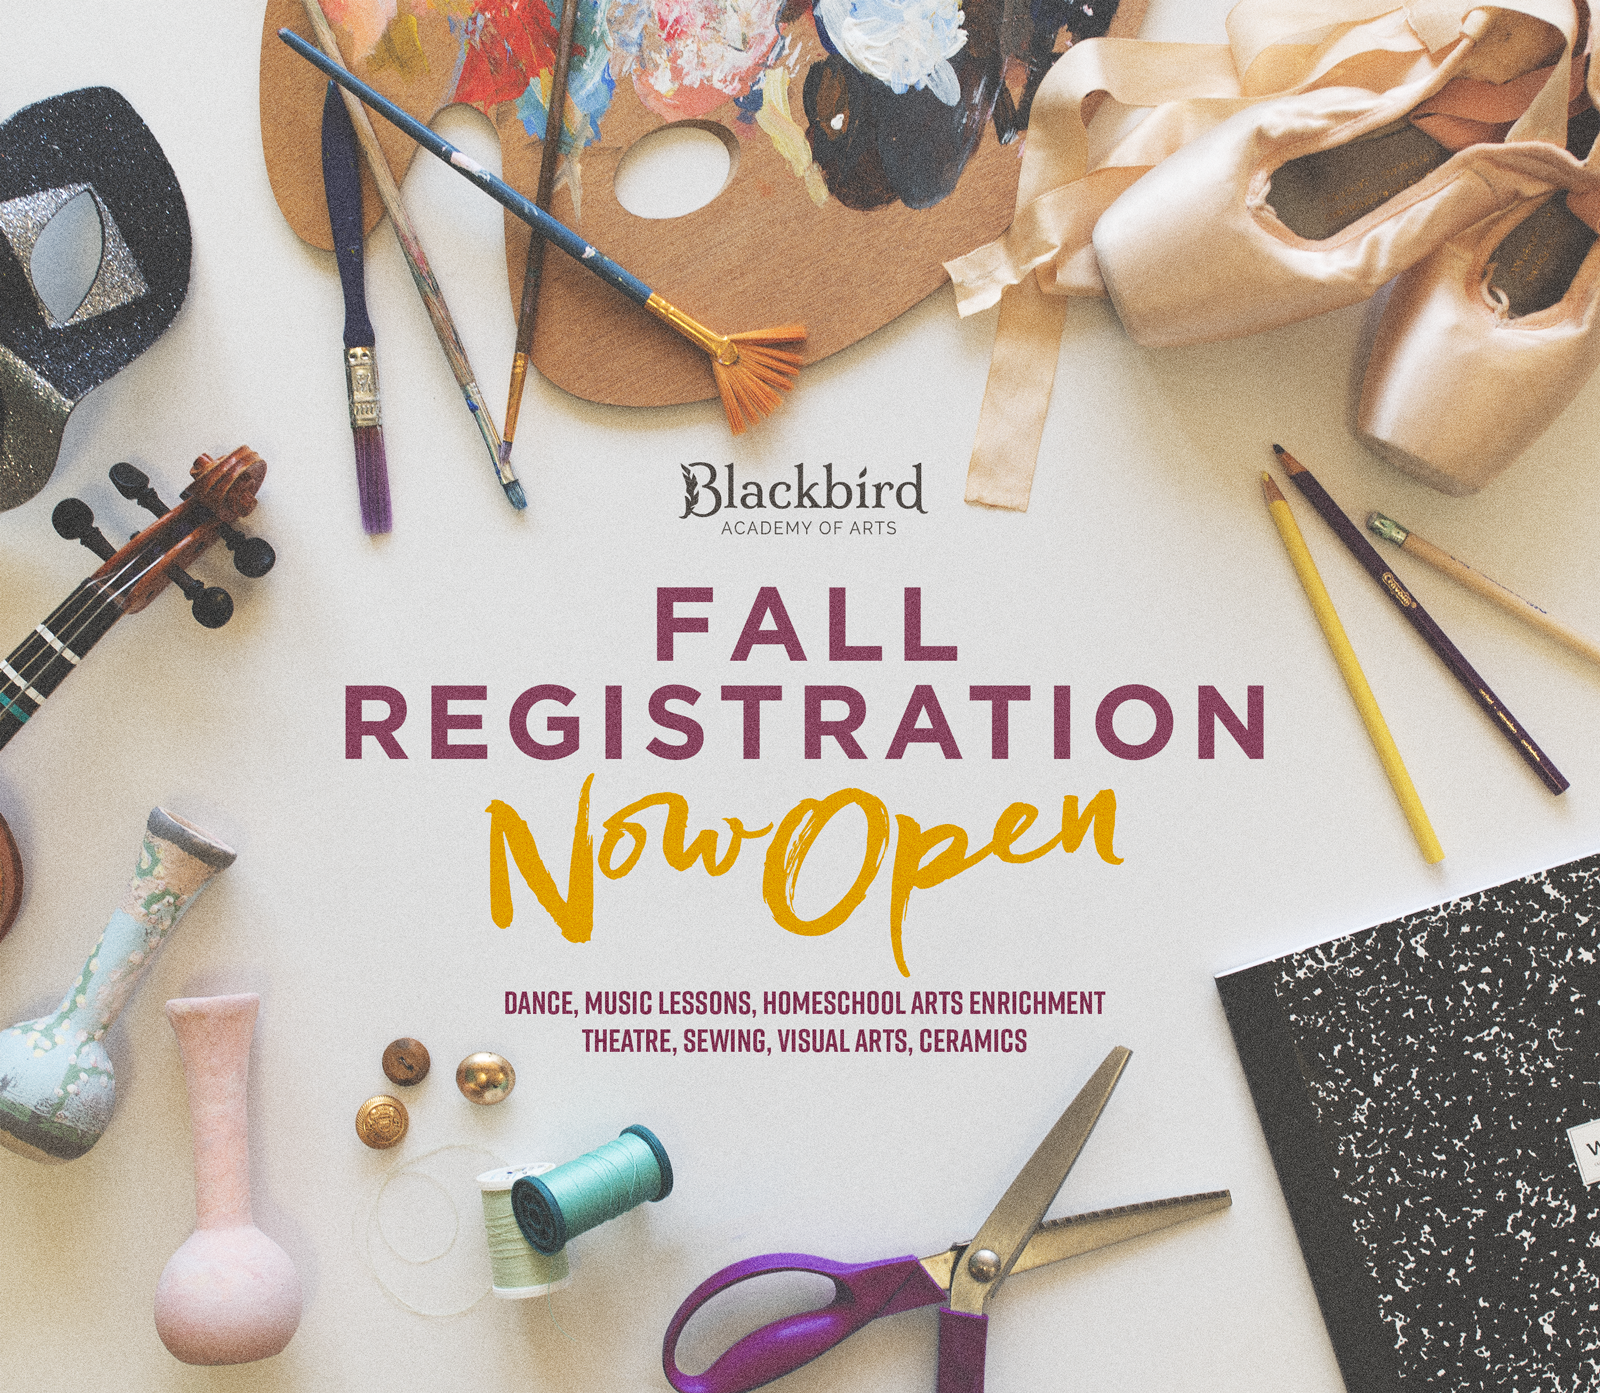 Blackbird Academy of Arts